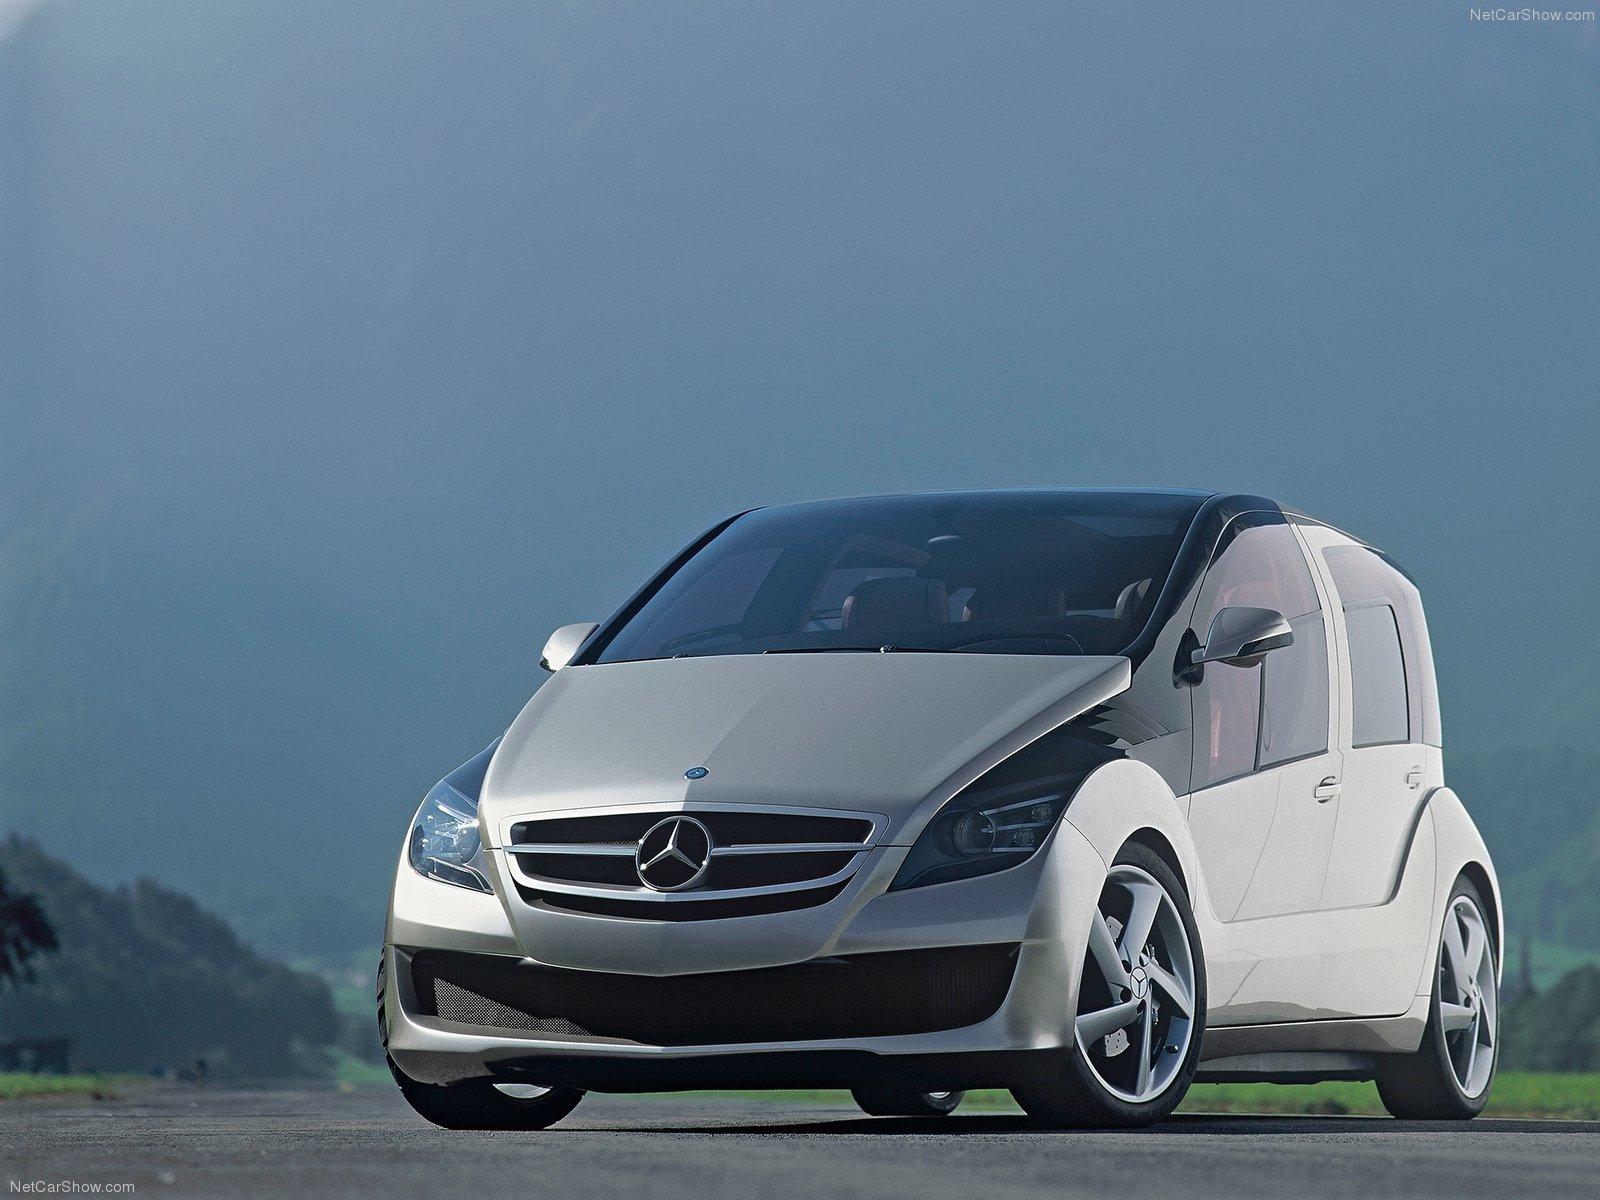 2005 mercedes benz f600 hygenius mercedes benz for Mercedes benz latest technology